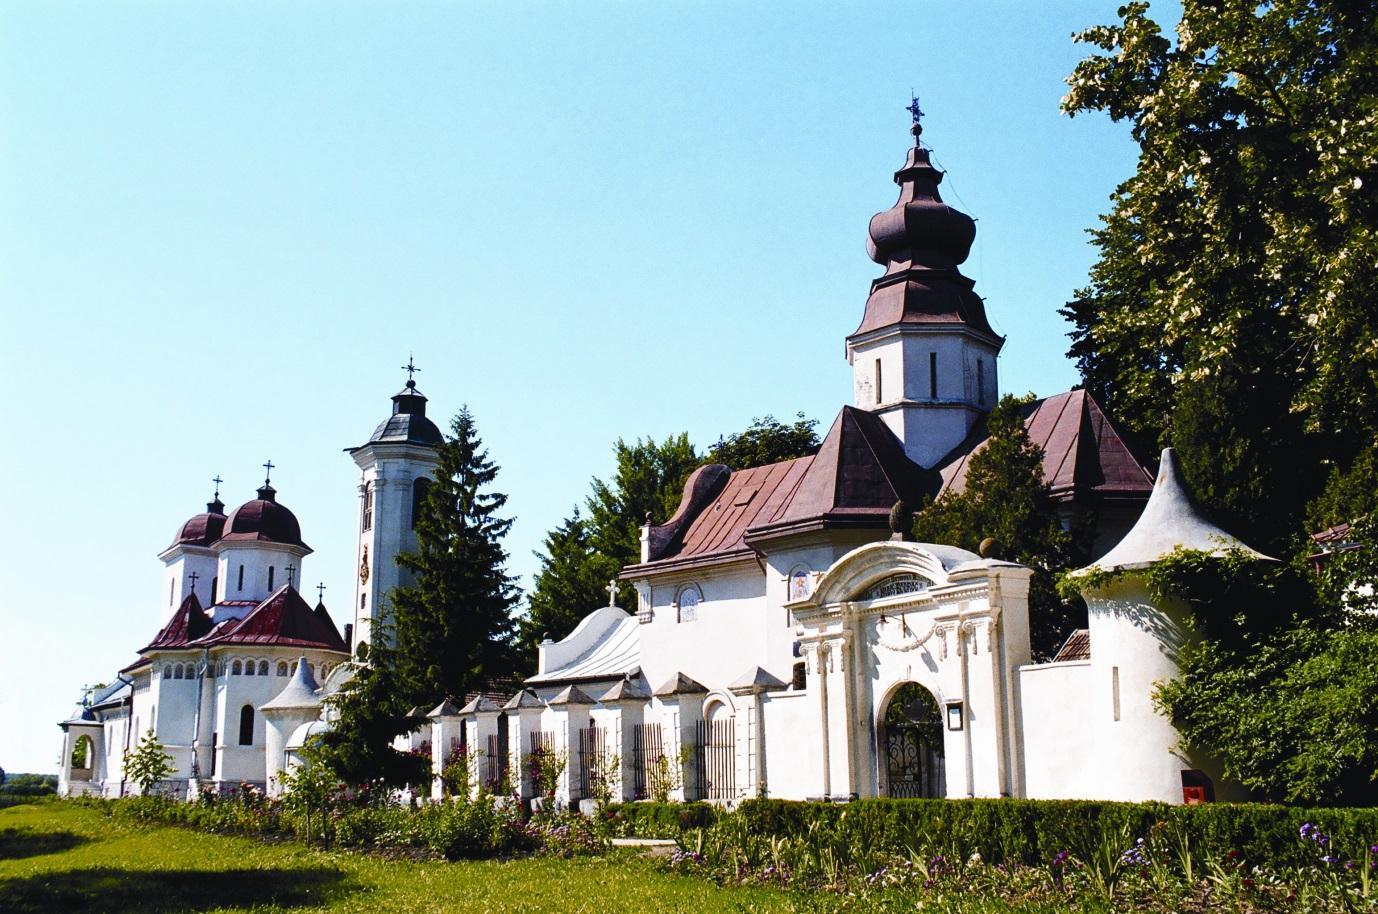 http://glsa.ro/wp-content/uploads/2014/02/Manastirea-Hodos-Bodrog-cea-mai-veche-manastire-cu-locuire-monahala-neintrerupta-din-tara.jpg